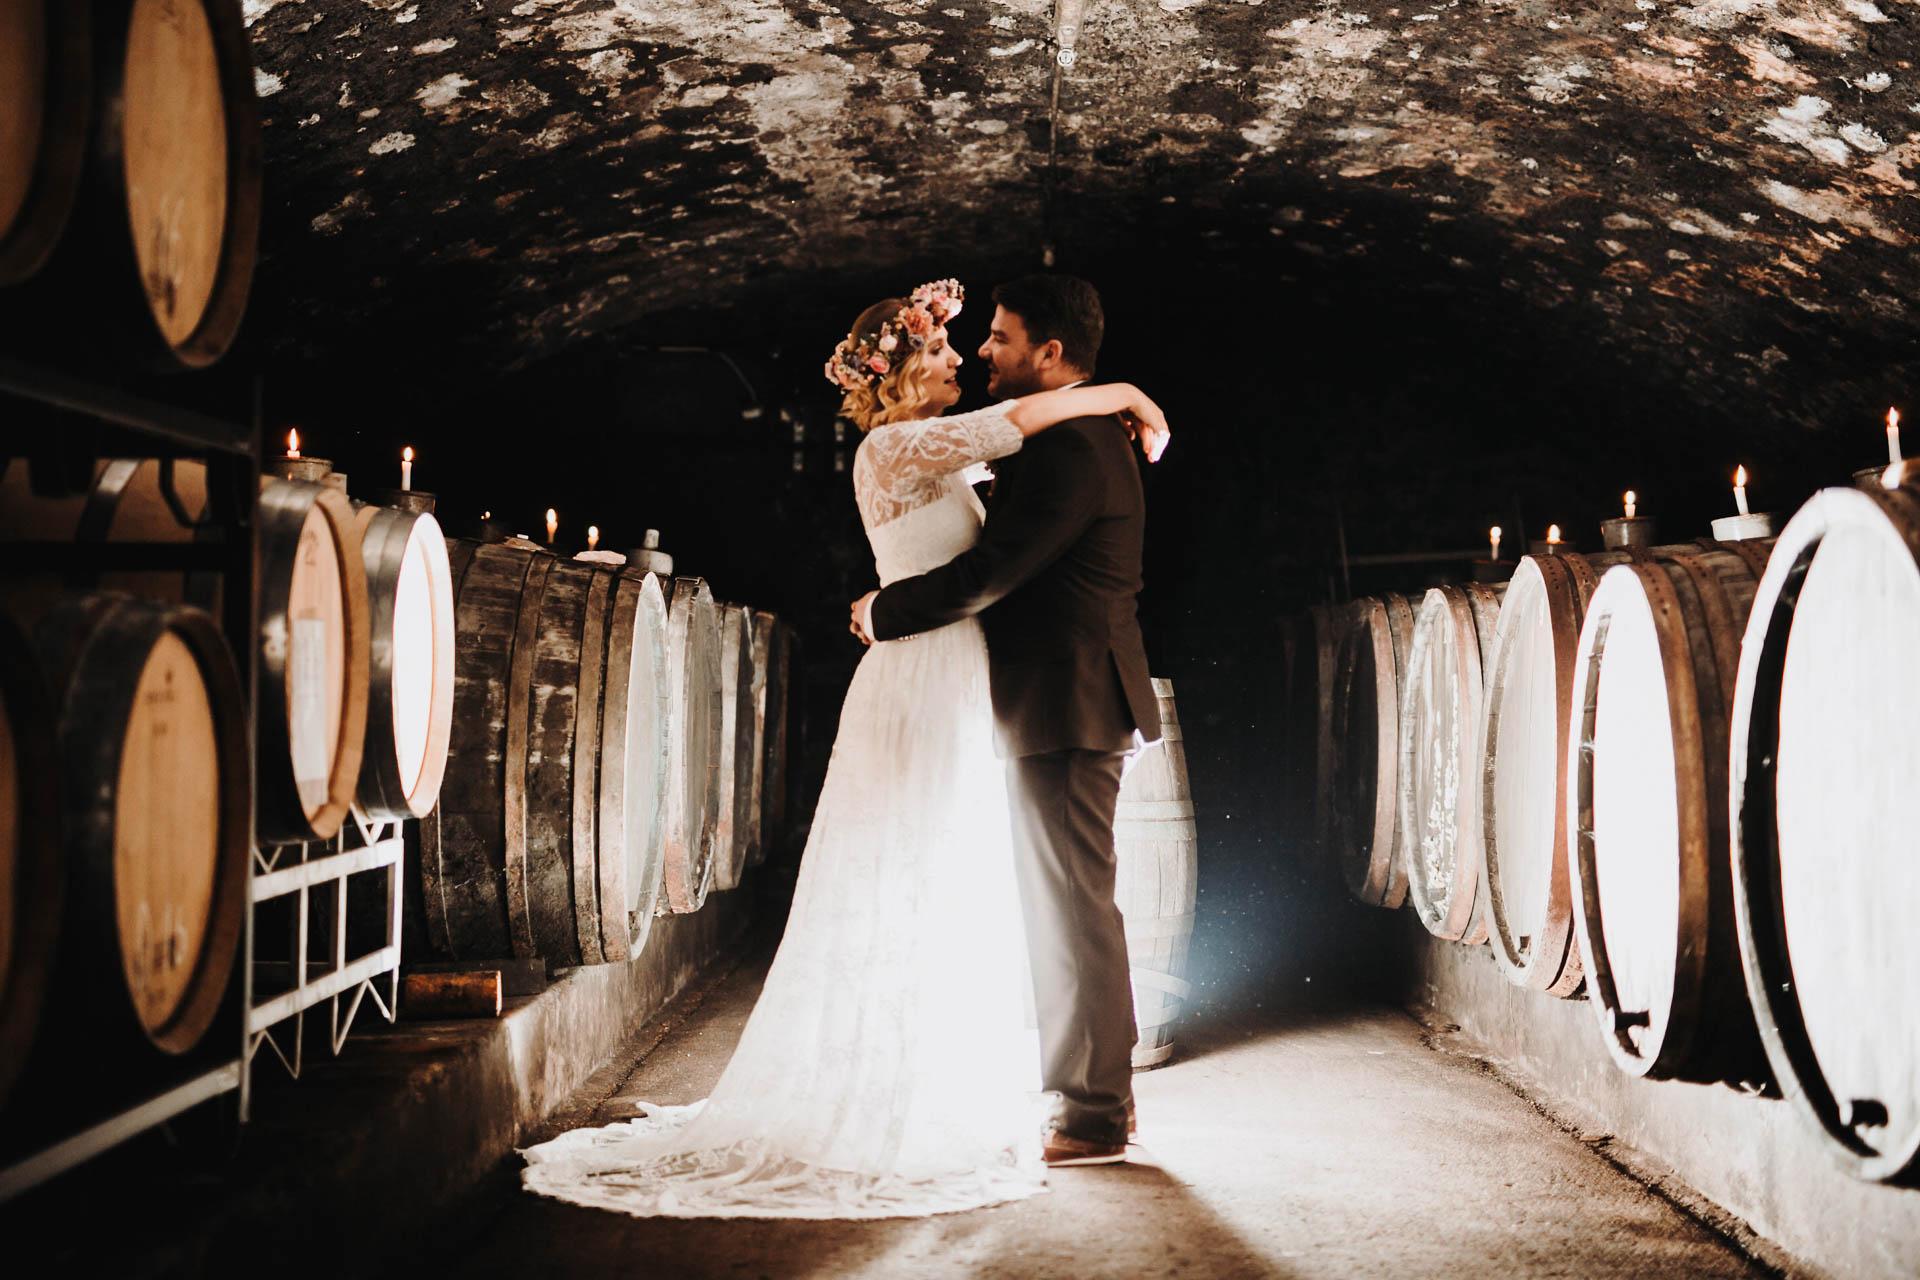 Brautpaarshooting im Weinkeller